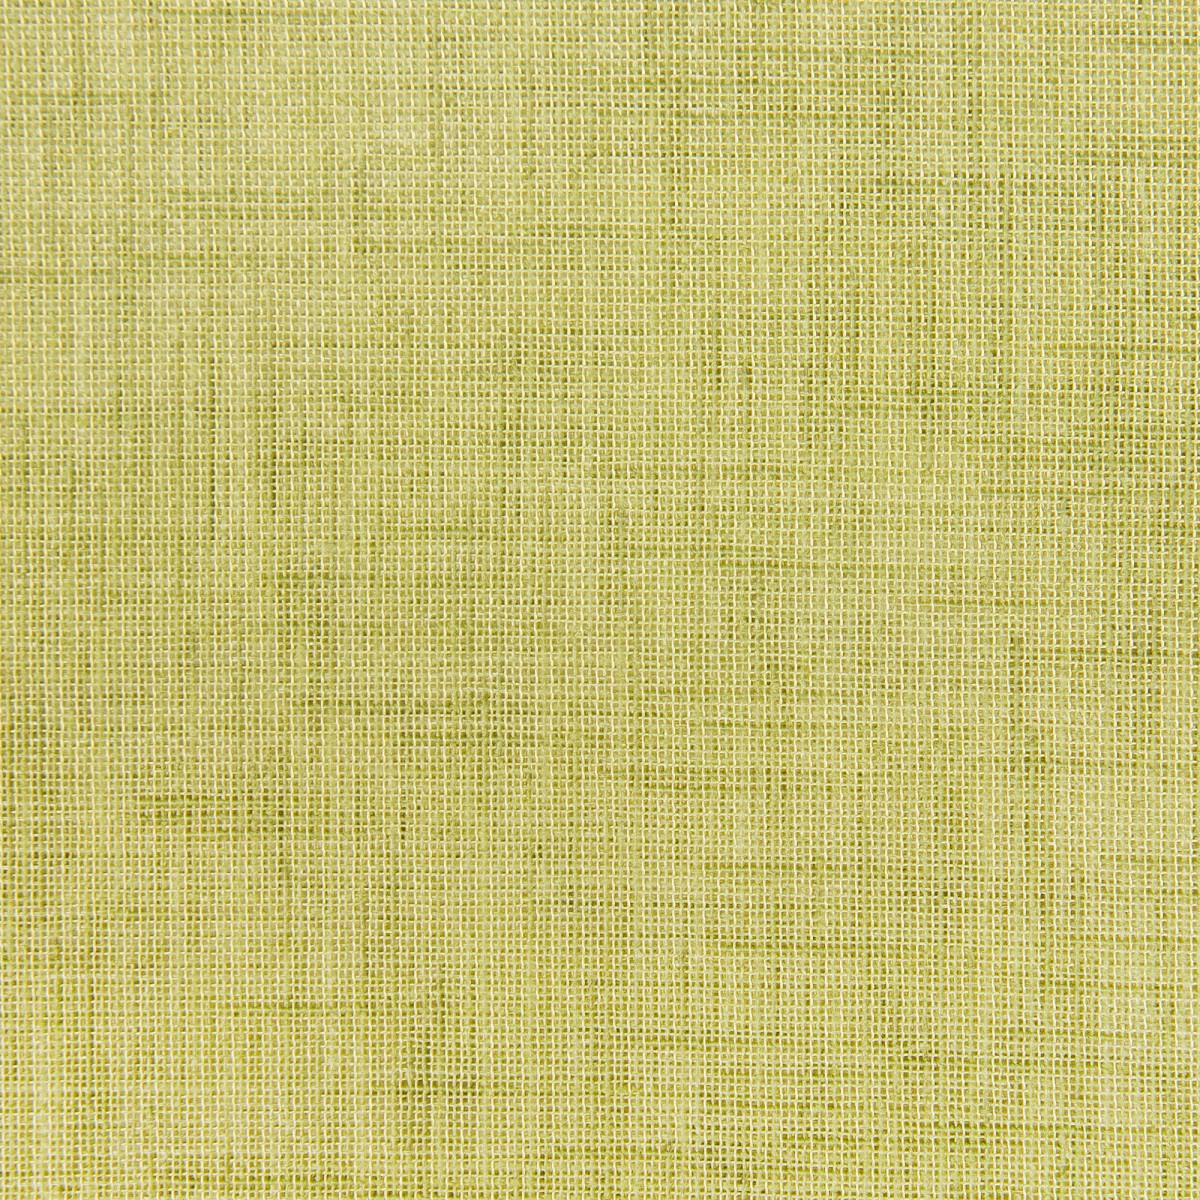 Ткань 1 п/м под лен 285 см цвет зеленый